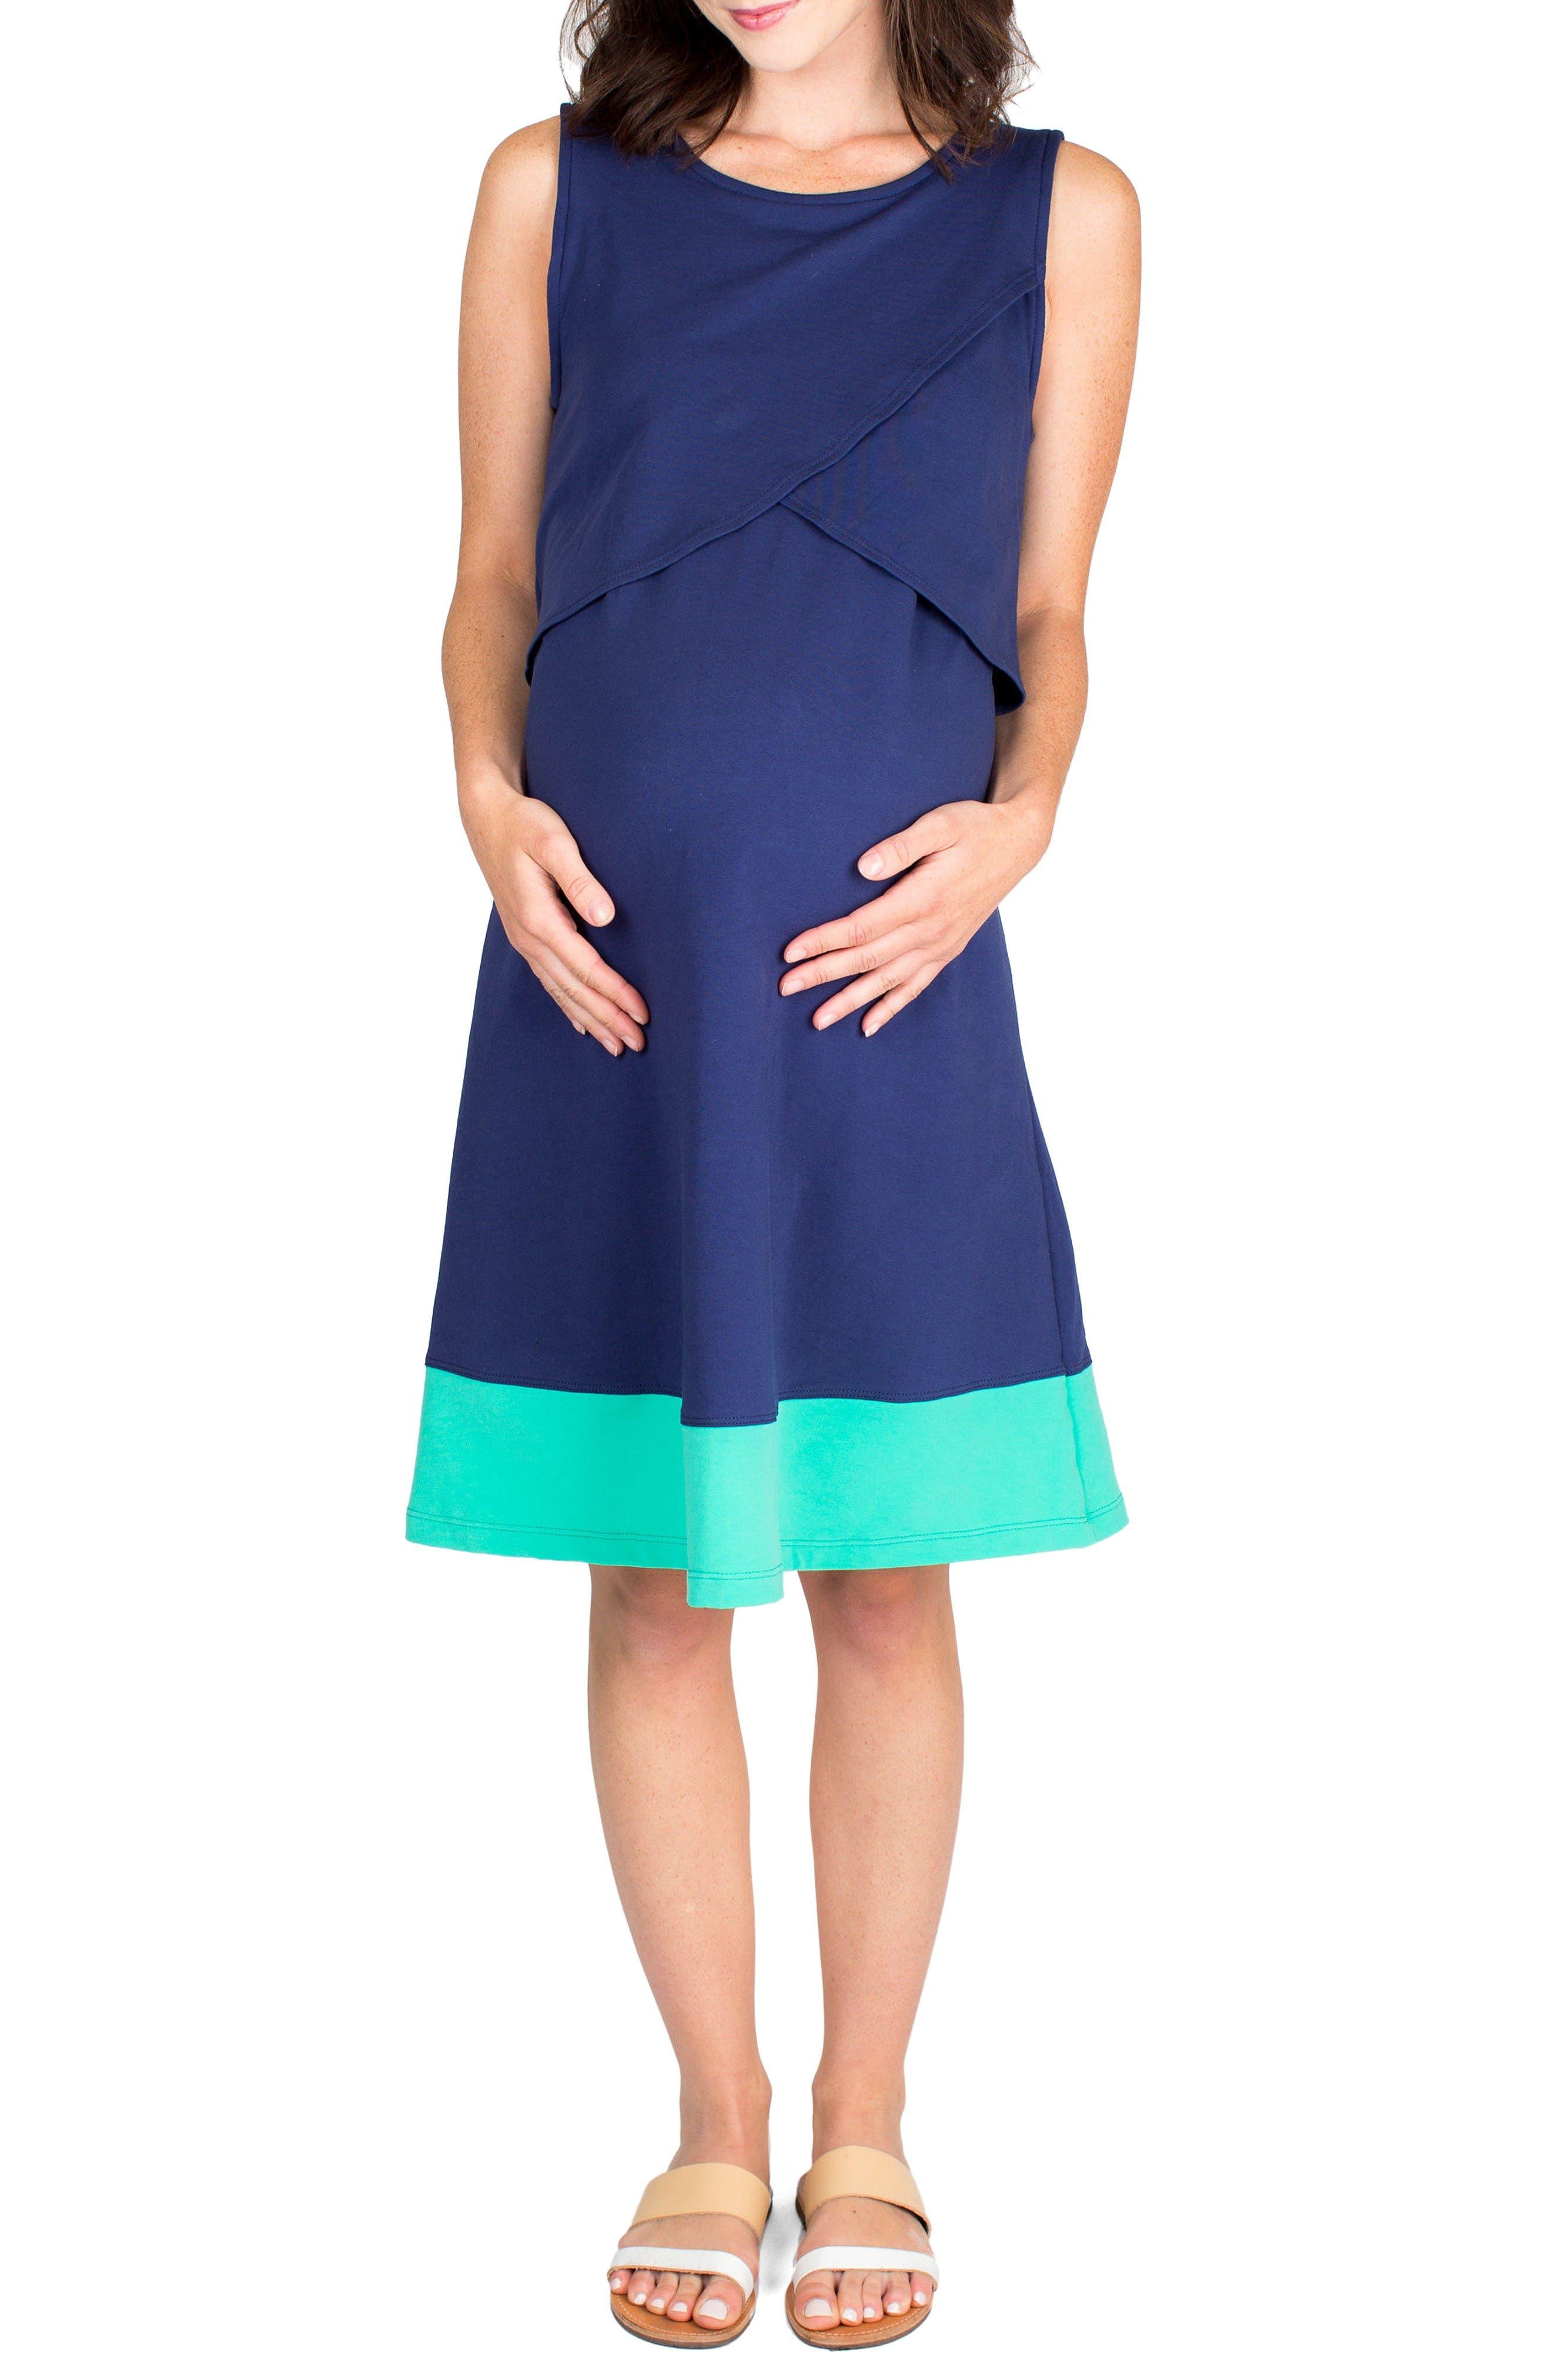 Sophia Maternity/Nursing Dress,                         Main,                         color, Navy/ Mint